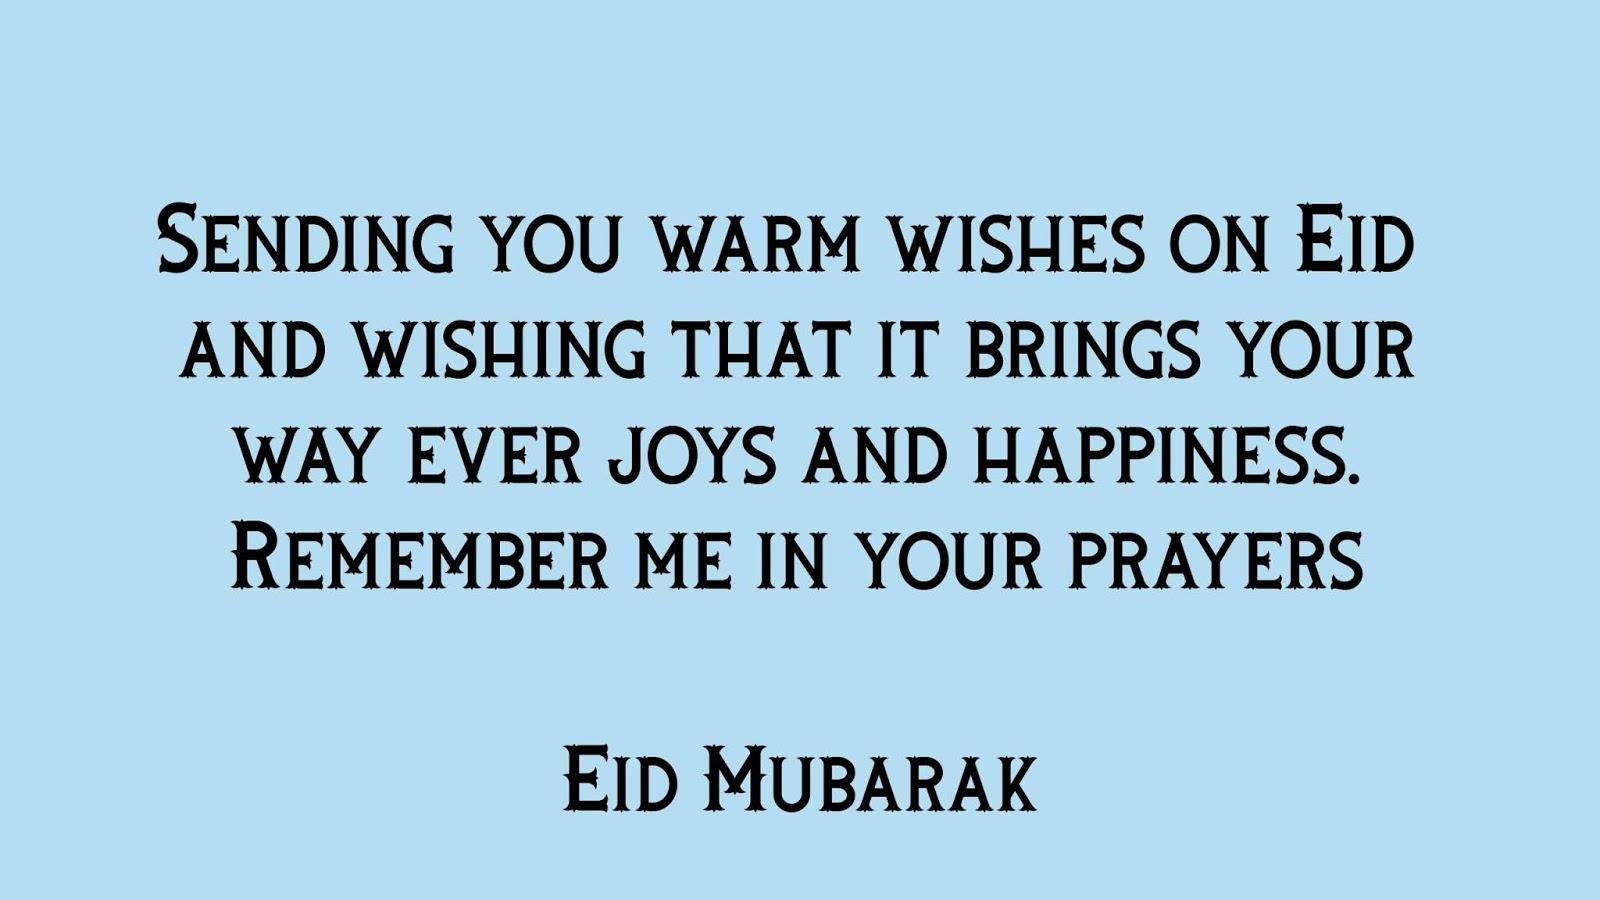 eid mubarak images 2020